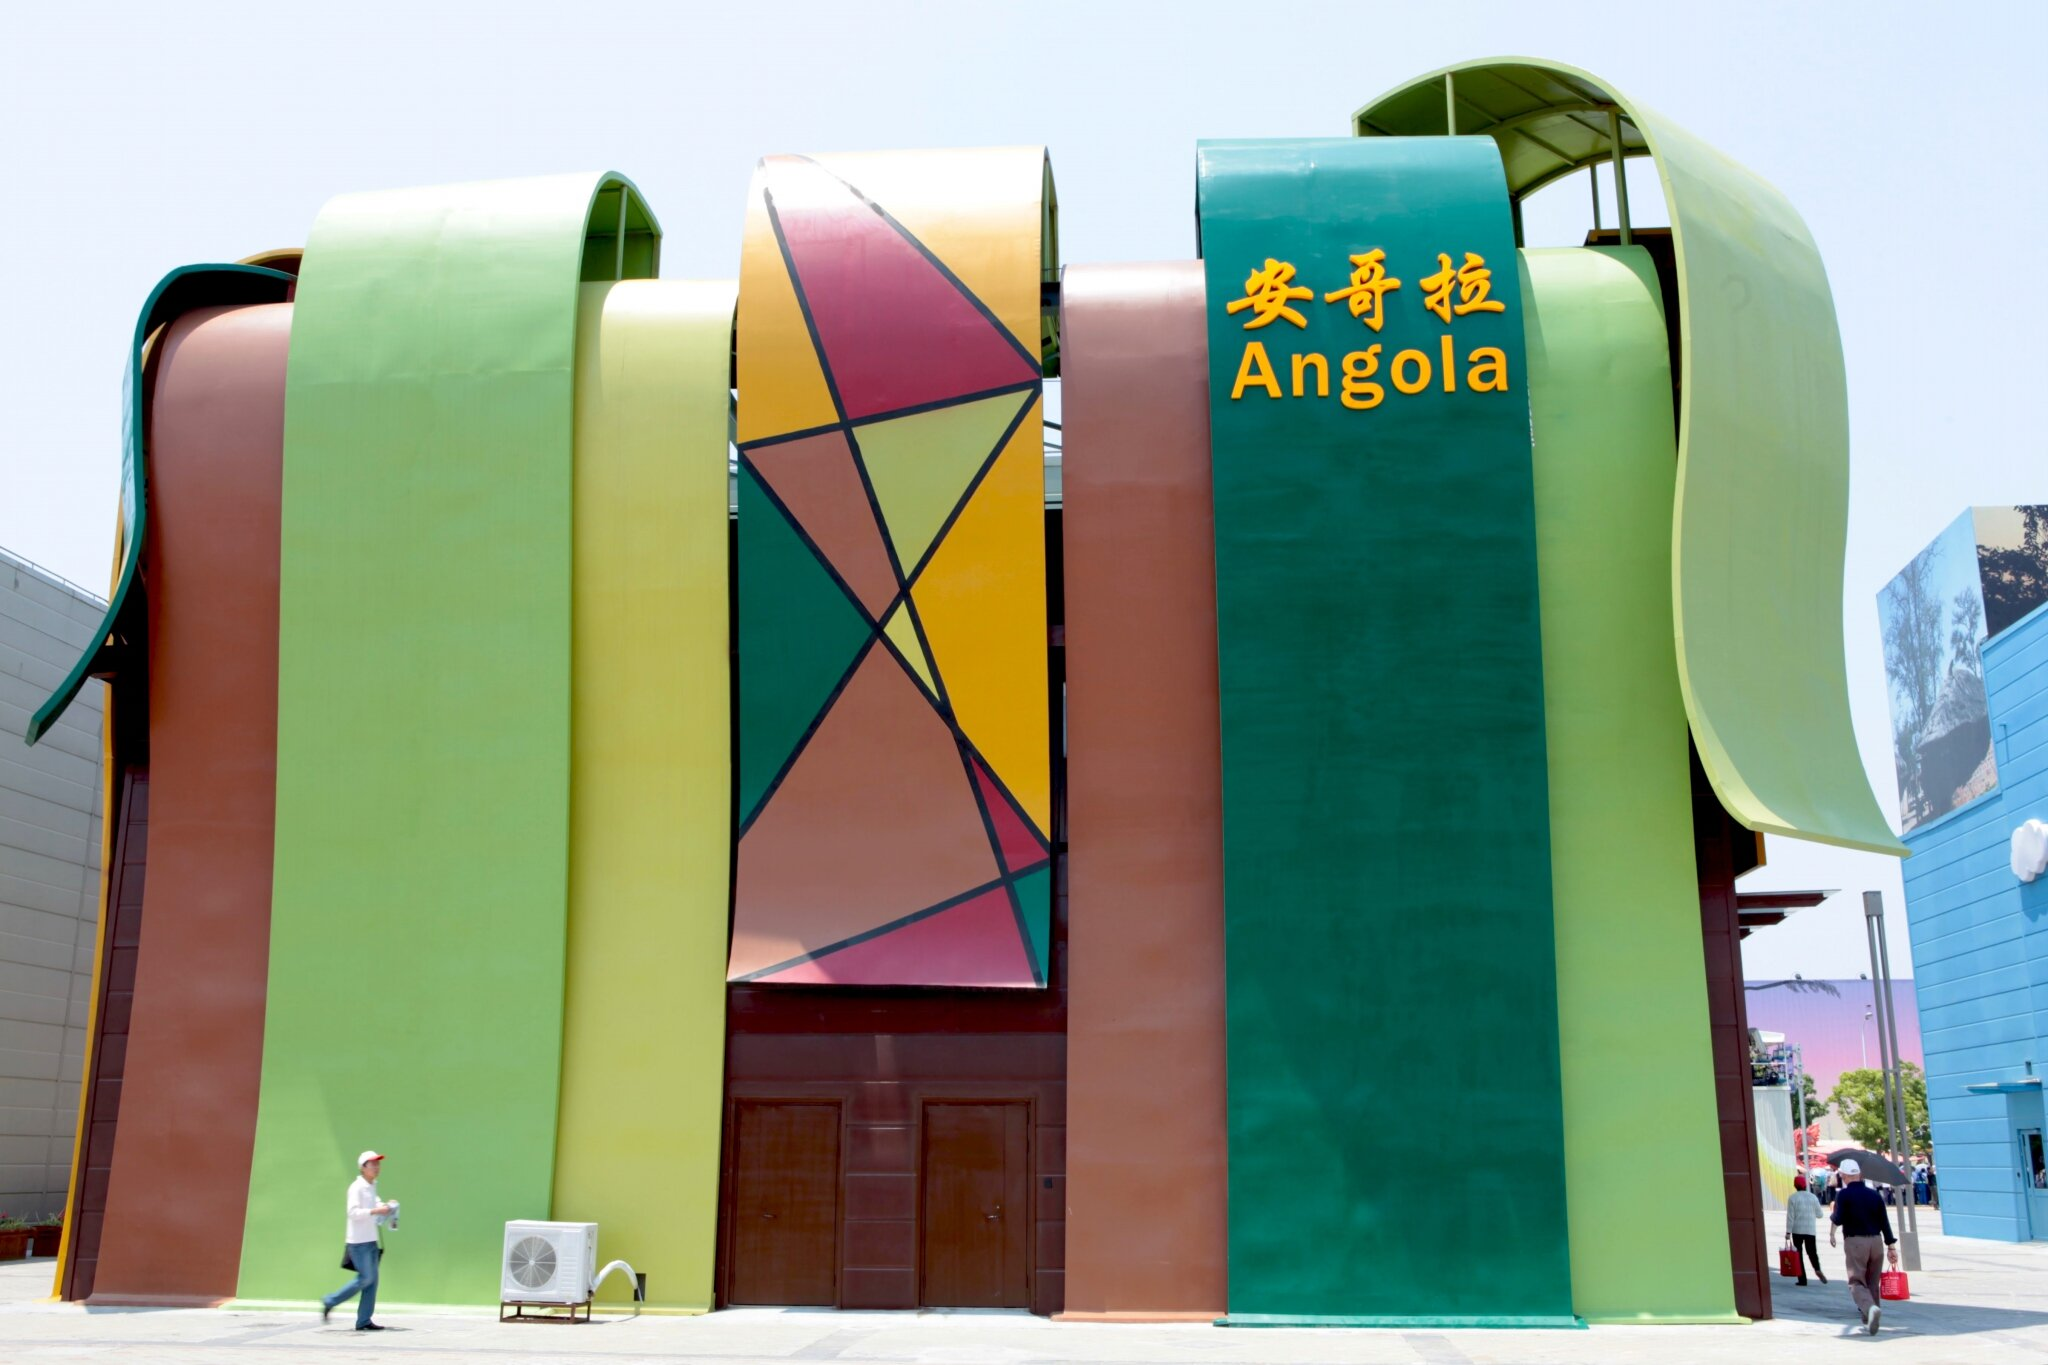 Pavillon de l'Angola